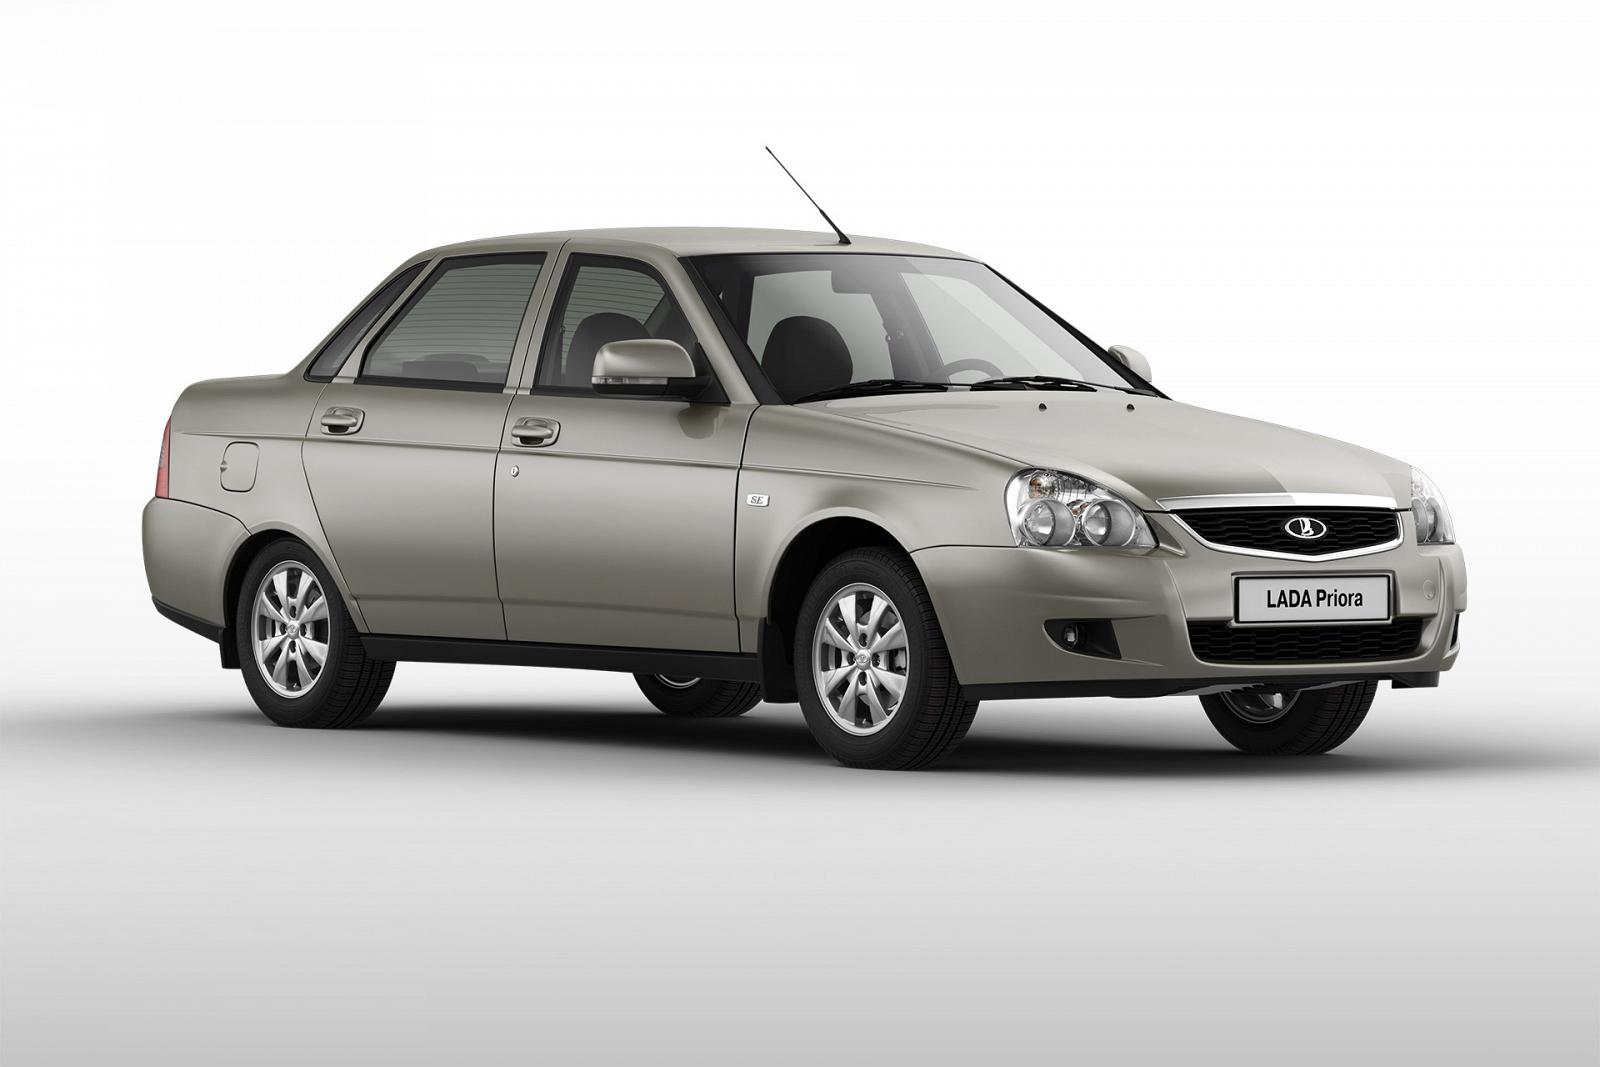 Лада Priora оказалась самым продаваемым авто вКазахстане